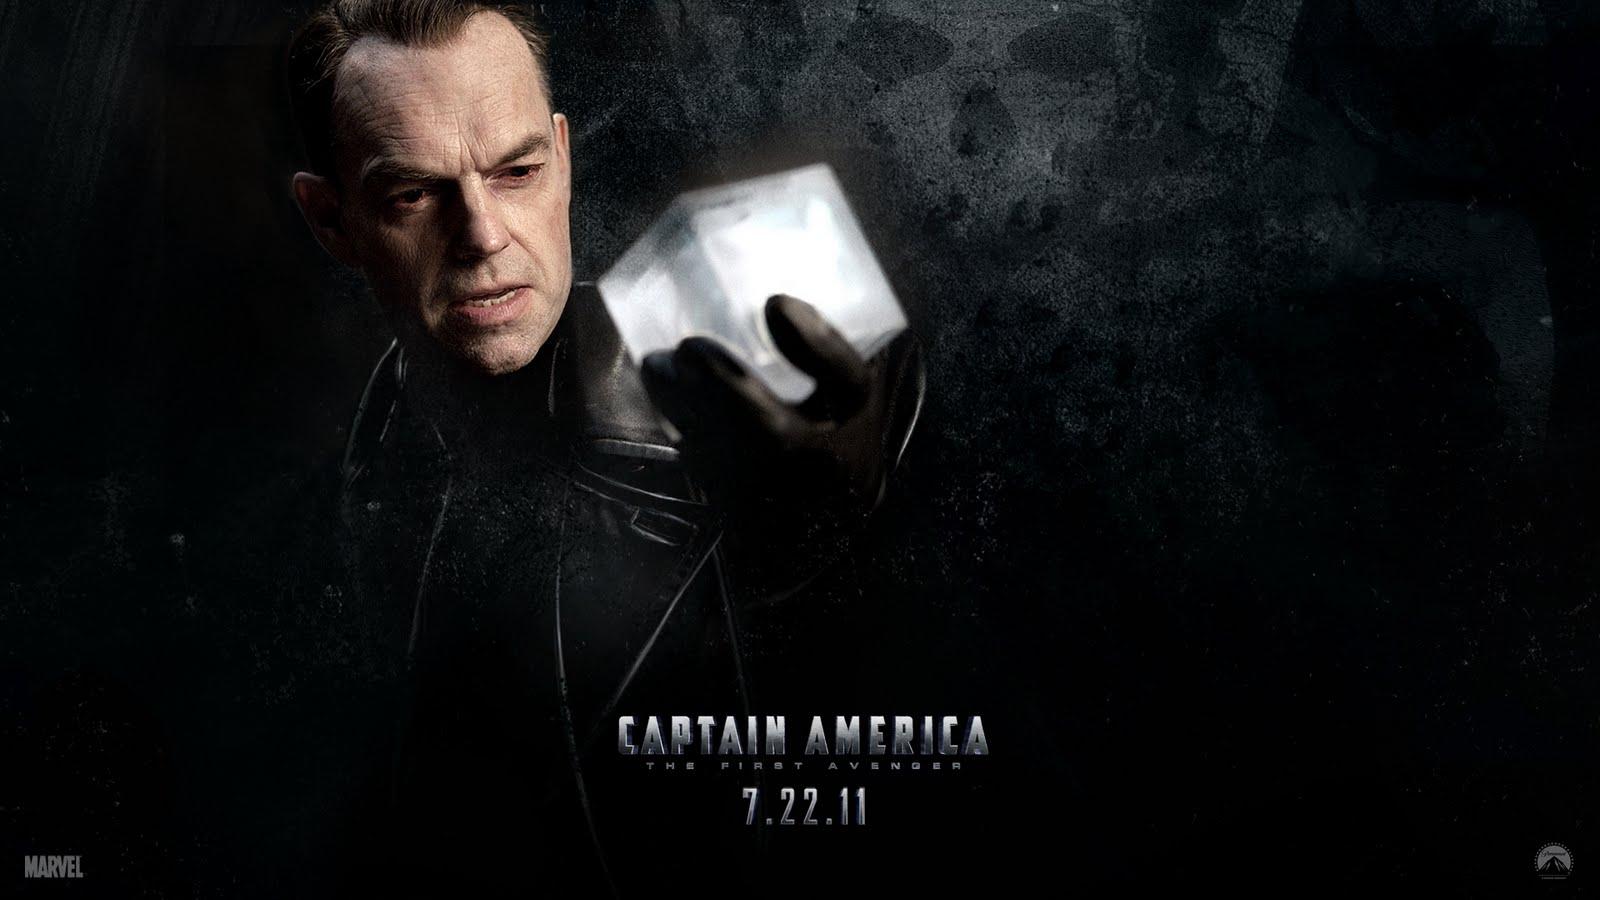 http://2.bp.blogspot.com/-4u7-3z-doX4/TjQ4osRVs-I/AAAAAAAAB5U/s4ovBRxRlNw/s1600/Hugo_Weaving_in_Captain_America%2B_The_First_Avenger_Wallpaper_5_1024.jpg